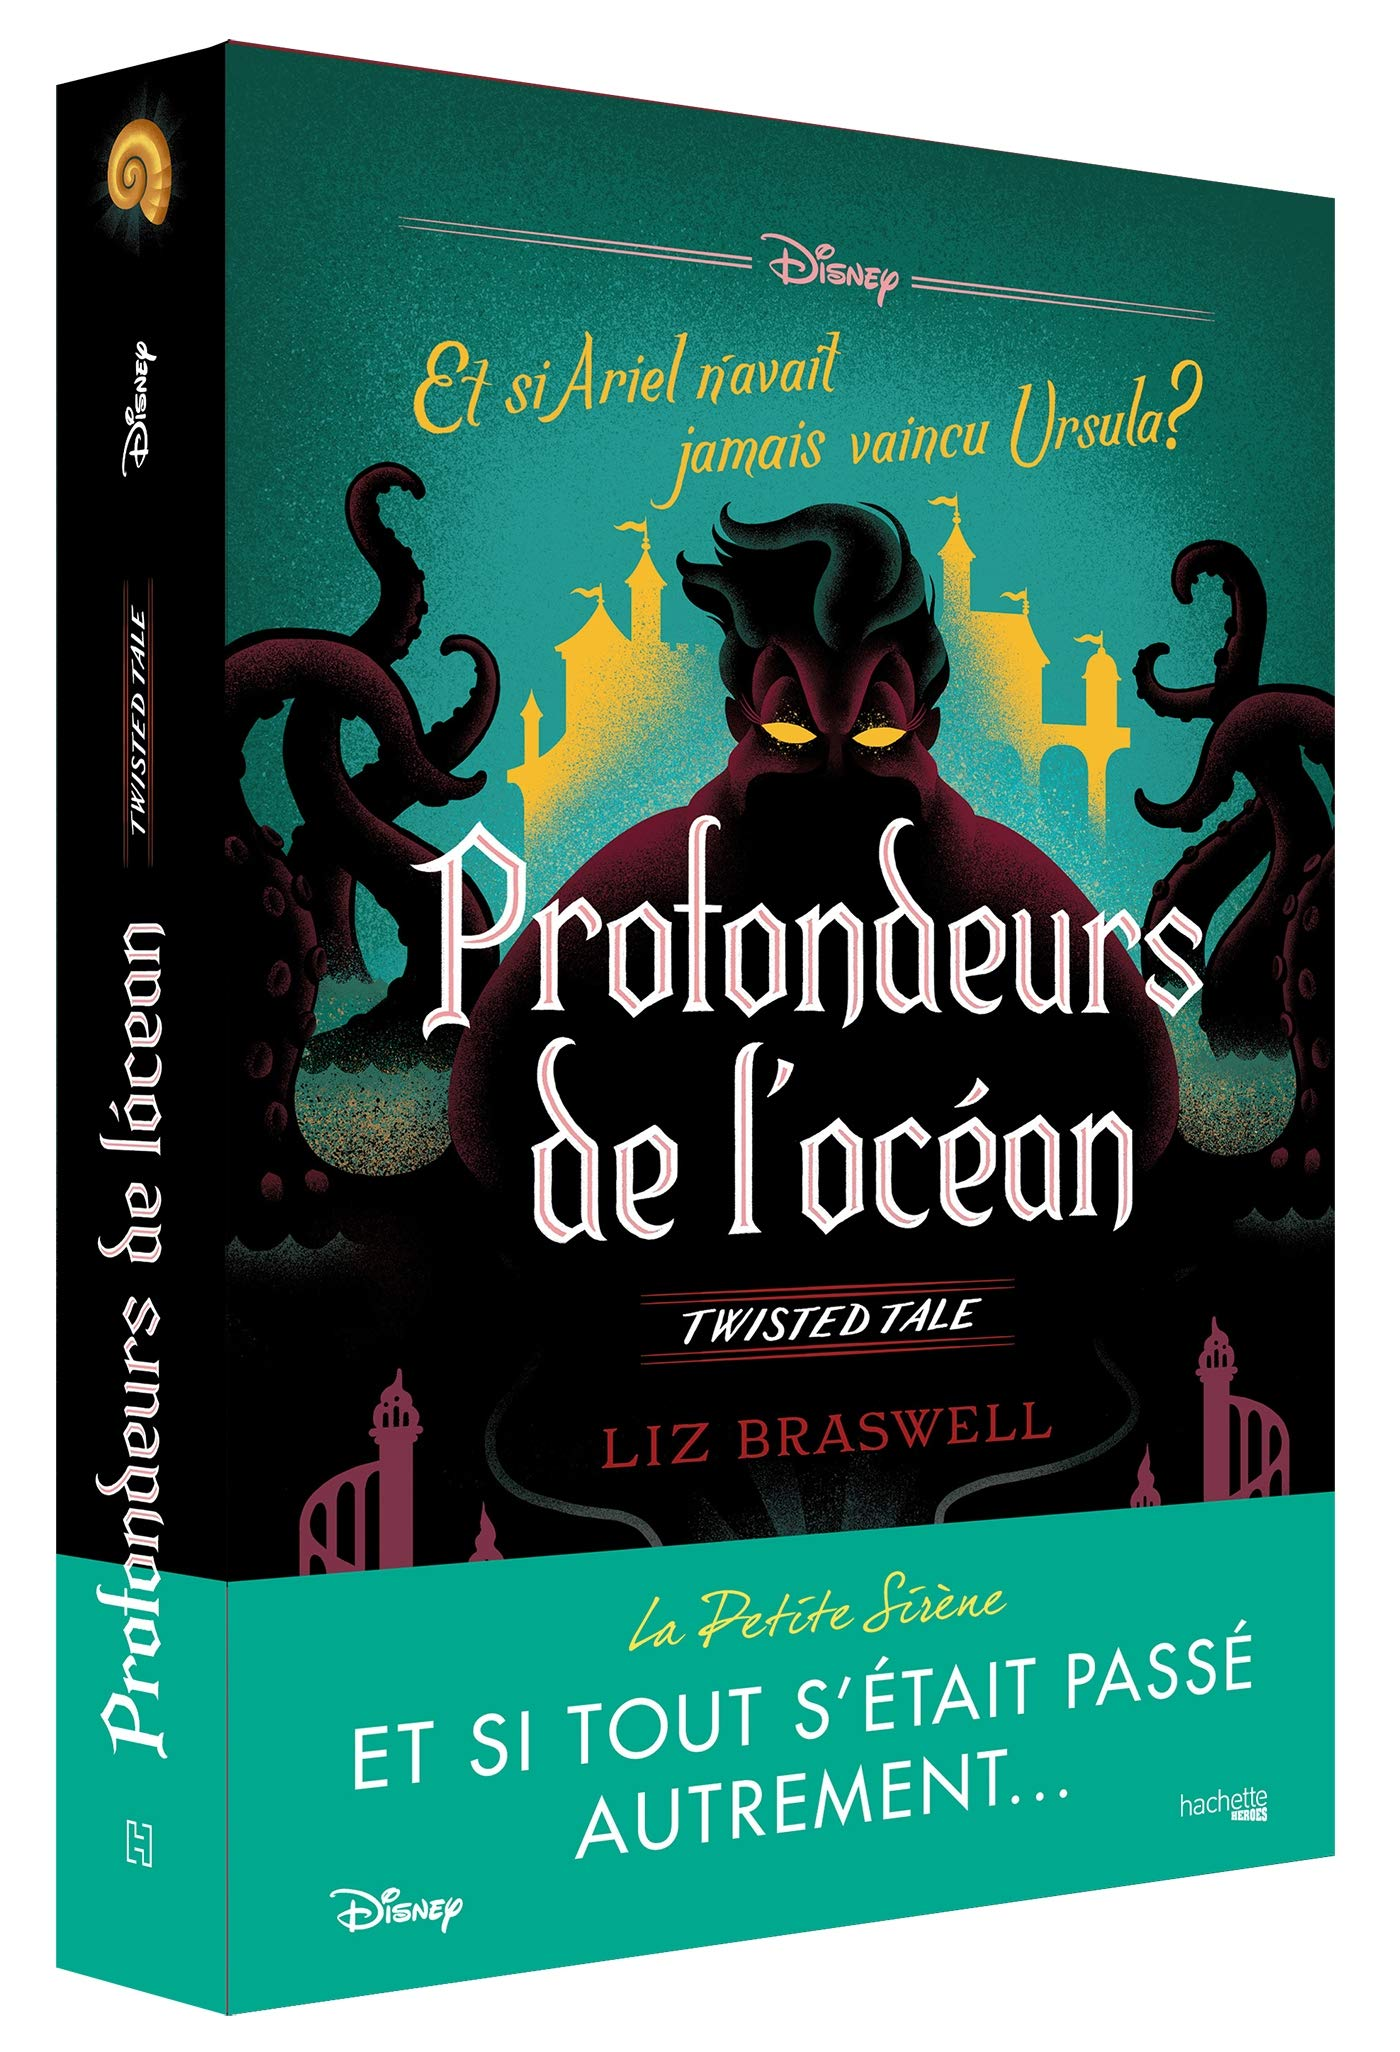 Disney Roman - Profondeur de l'océan Twisted Tales